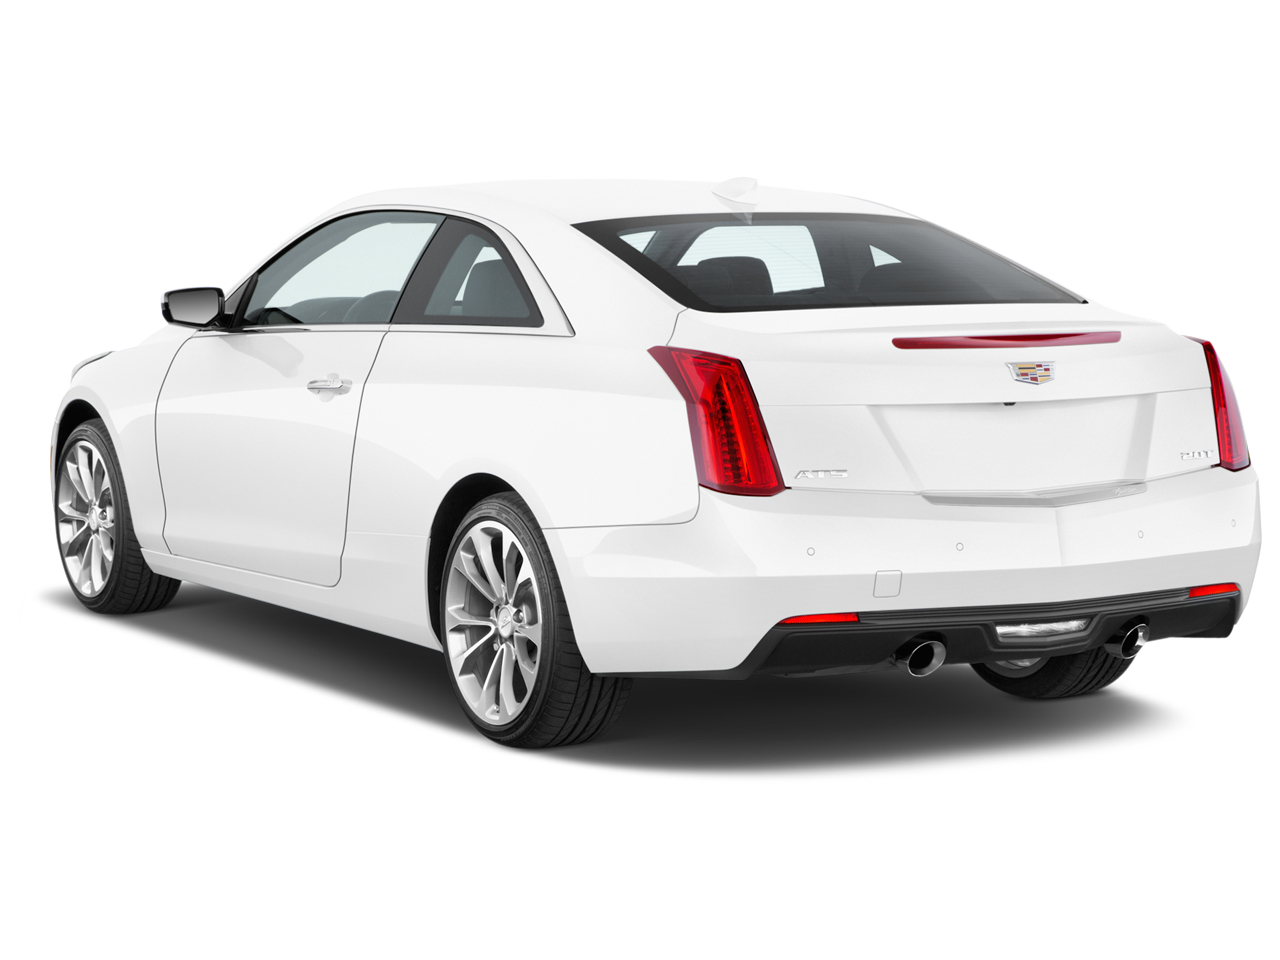 Cadillac ATS Coupe 2020 3.6L Premium Luxury, Saudi Arabia, 2019 pics migration